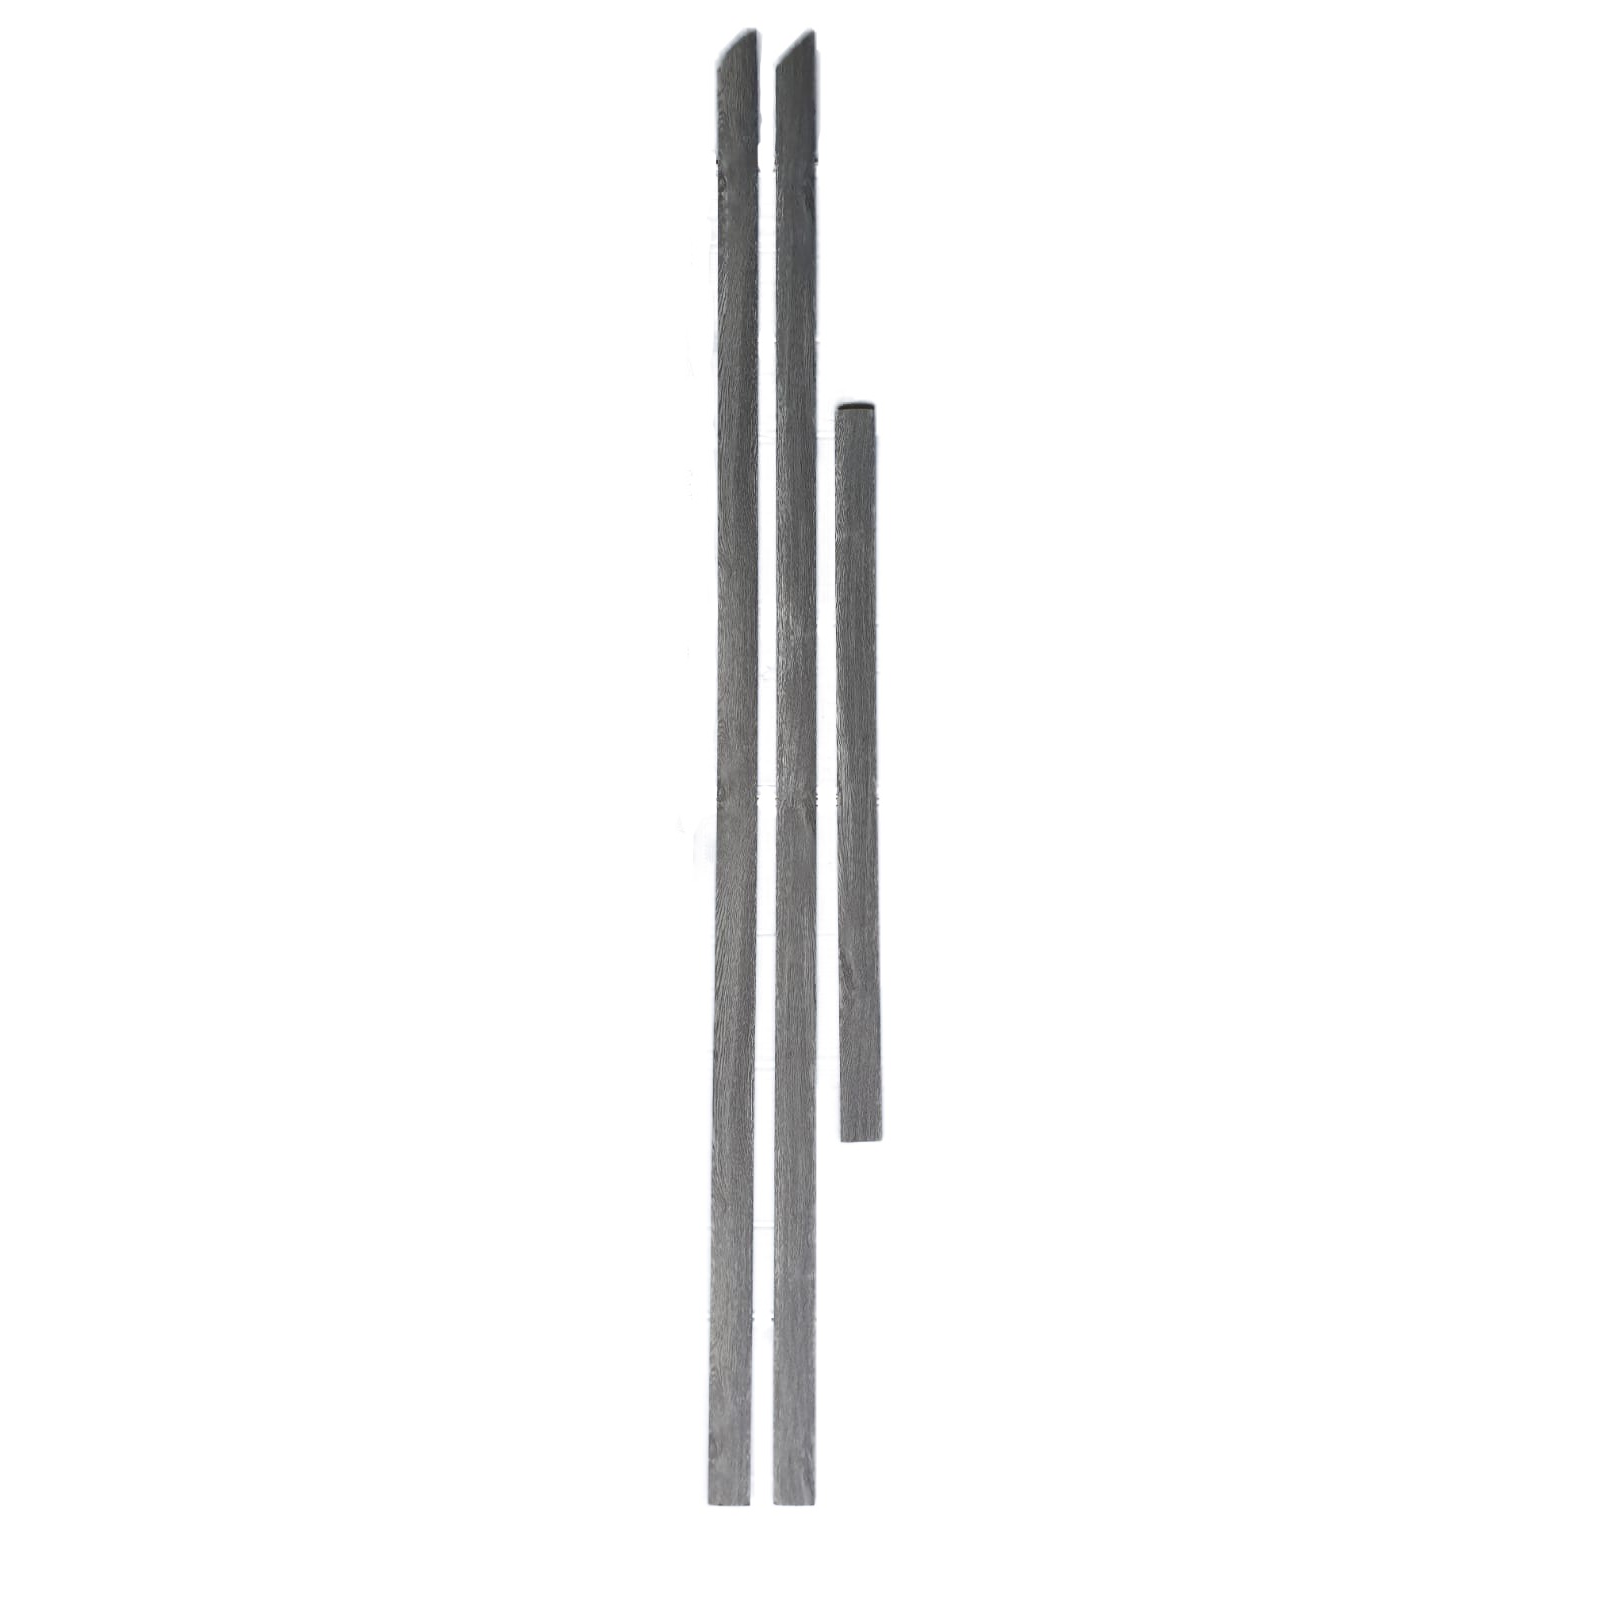 Pervaz usa interior gri, 6 x 0,5 cm imagine 2021 mathaus